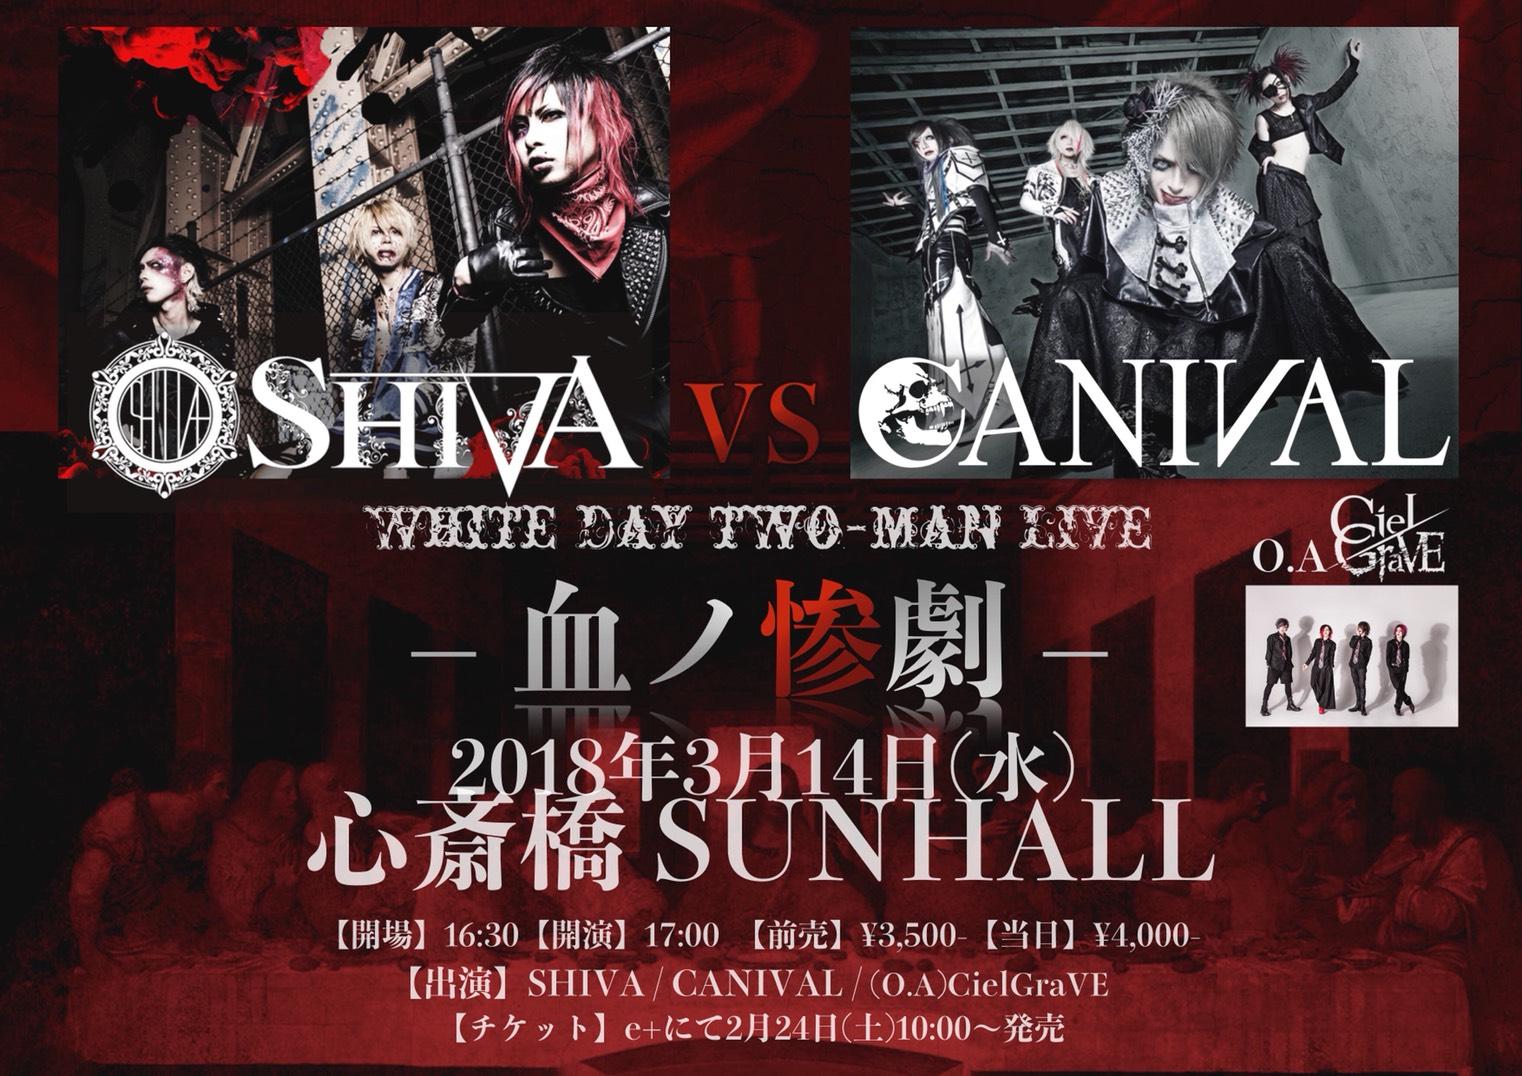 SHIVA WHITE DAY TWO-MAN 『SHIVA vs CANIVAL -血ノ惨劇-』